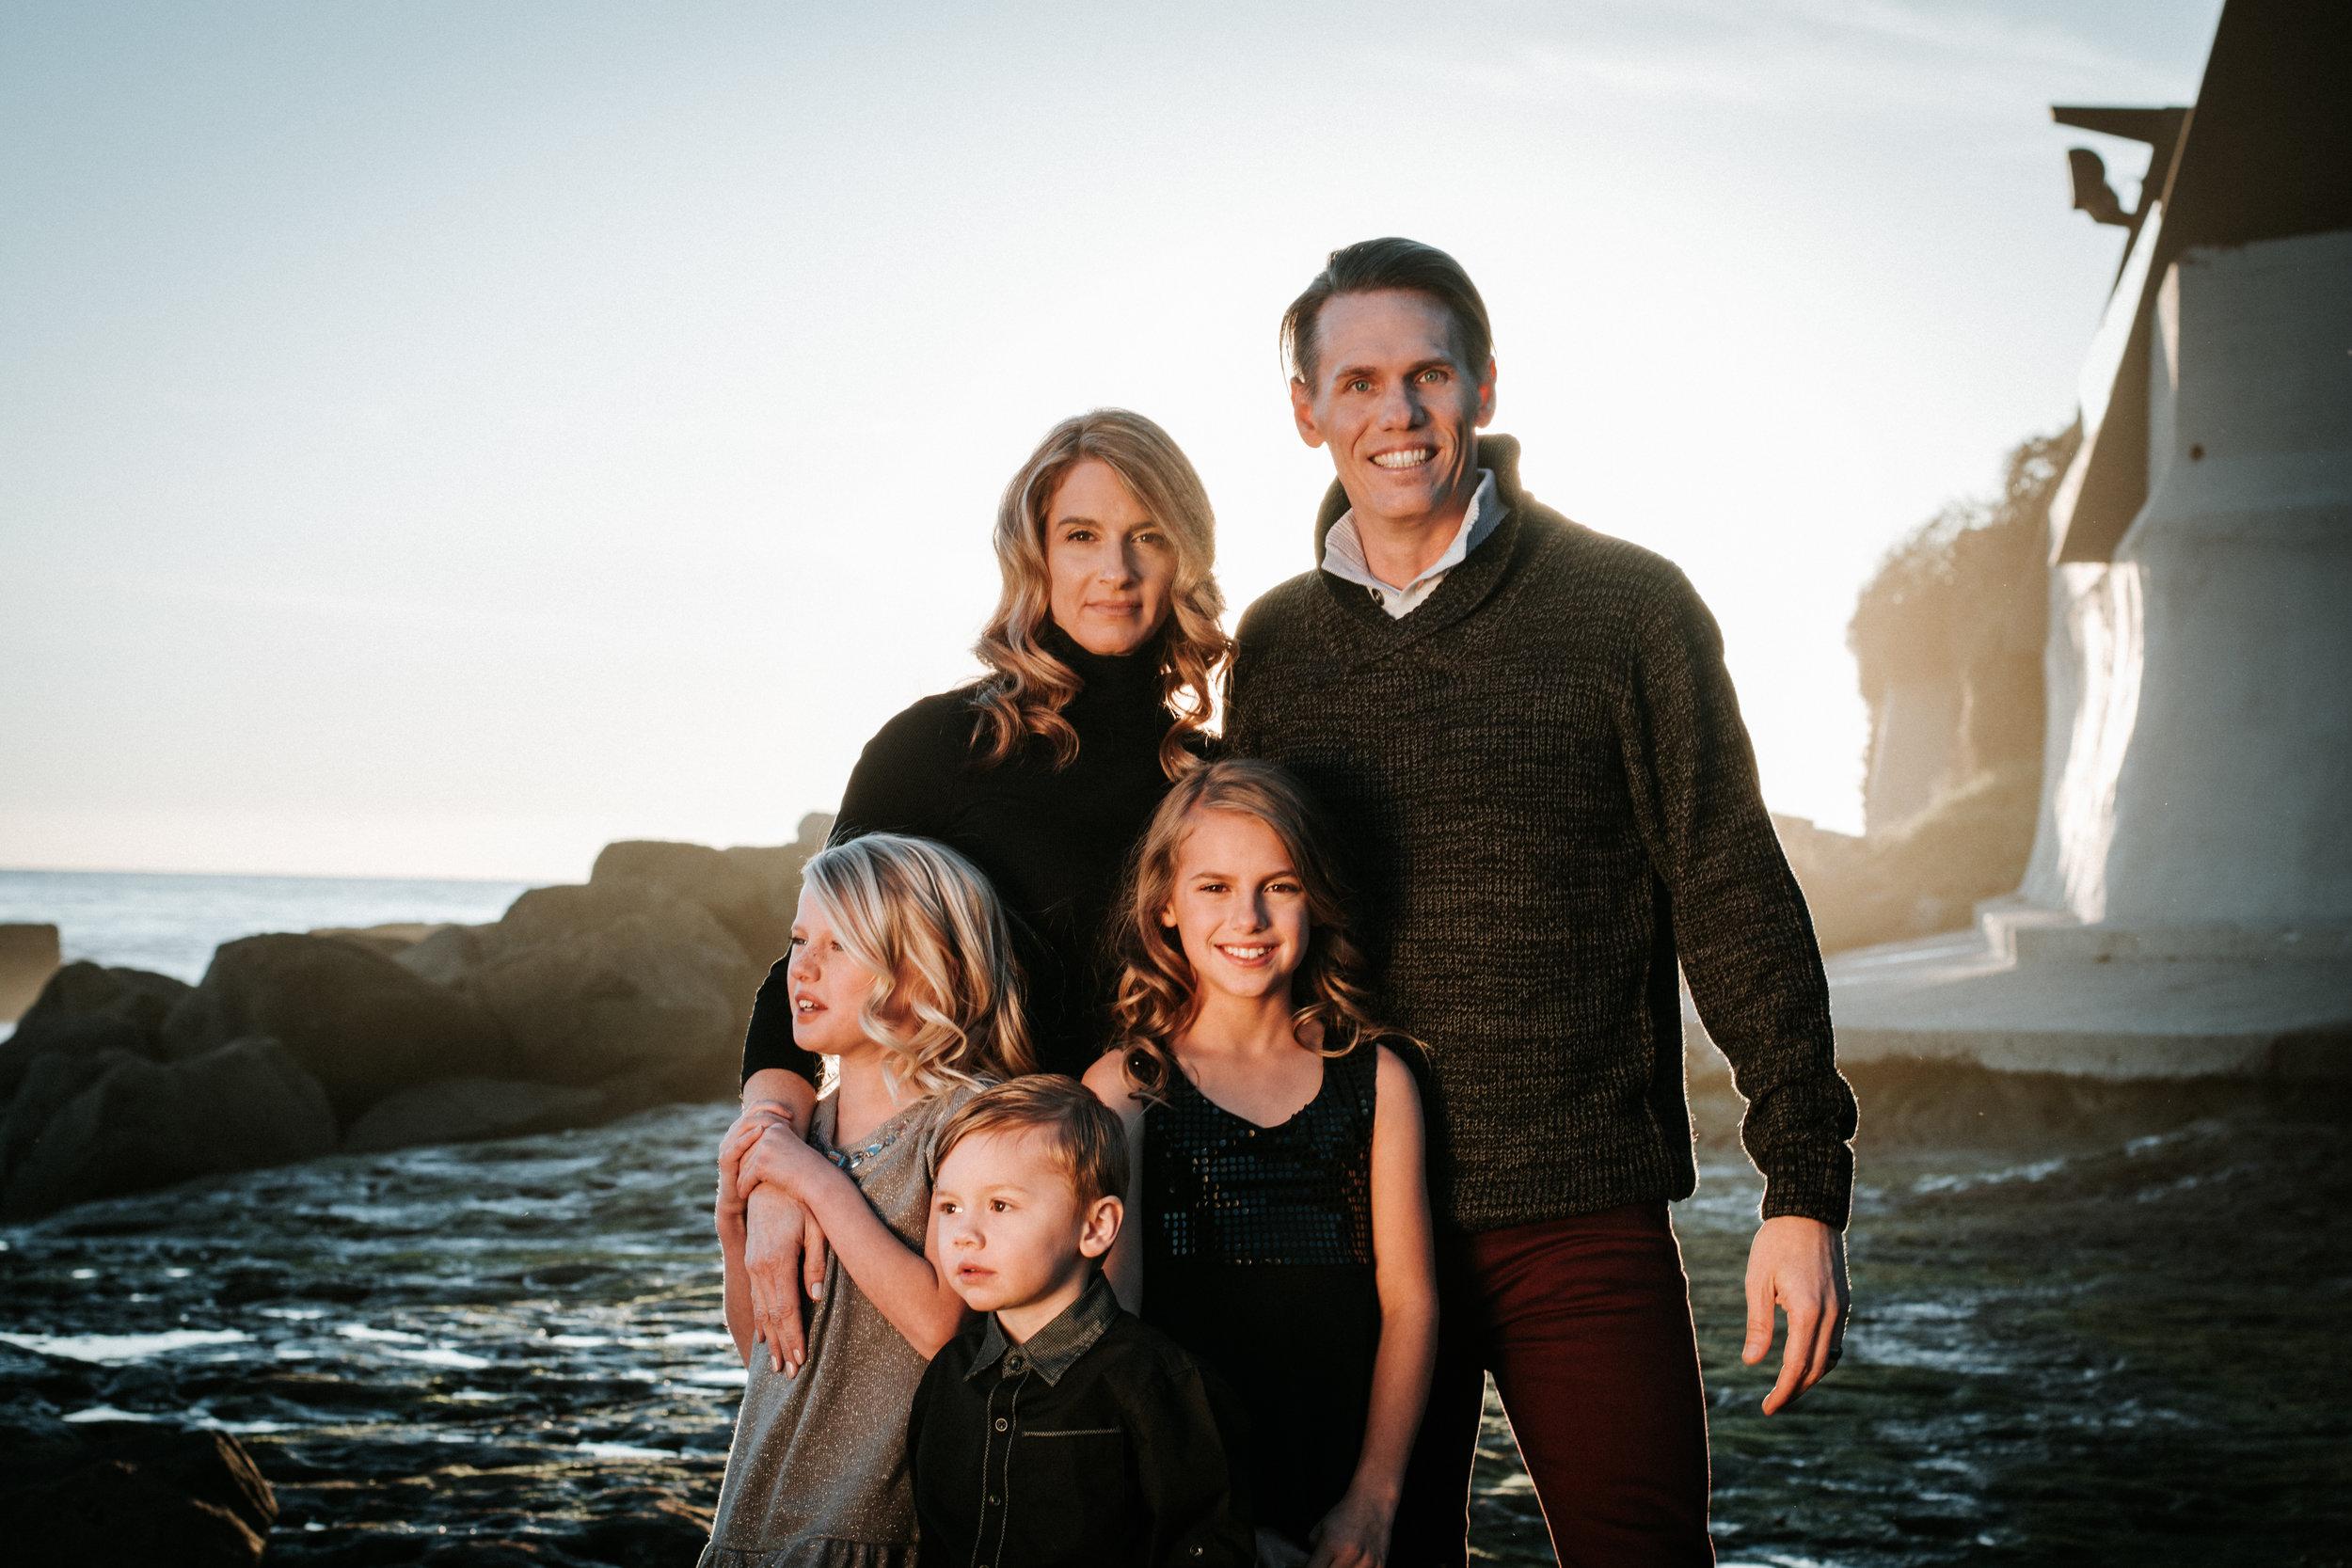 Burbatt Family ©darinmcginnisphotography